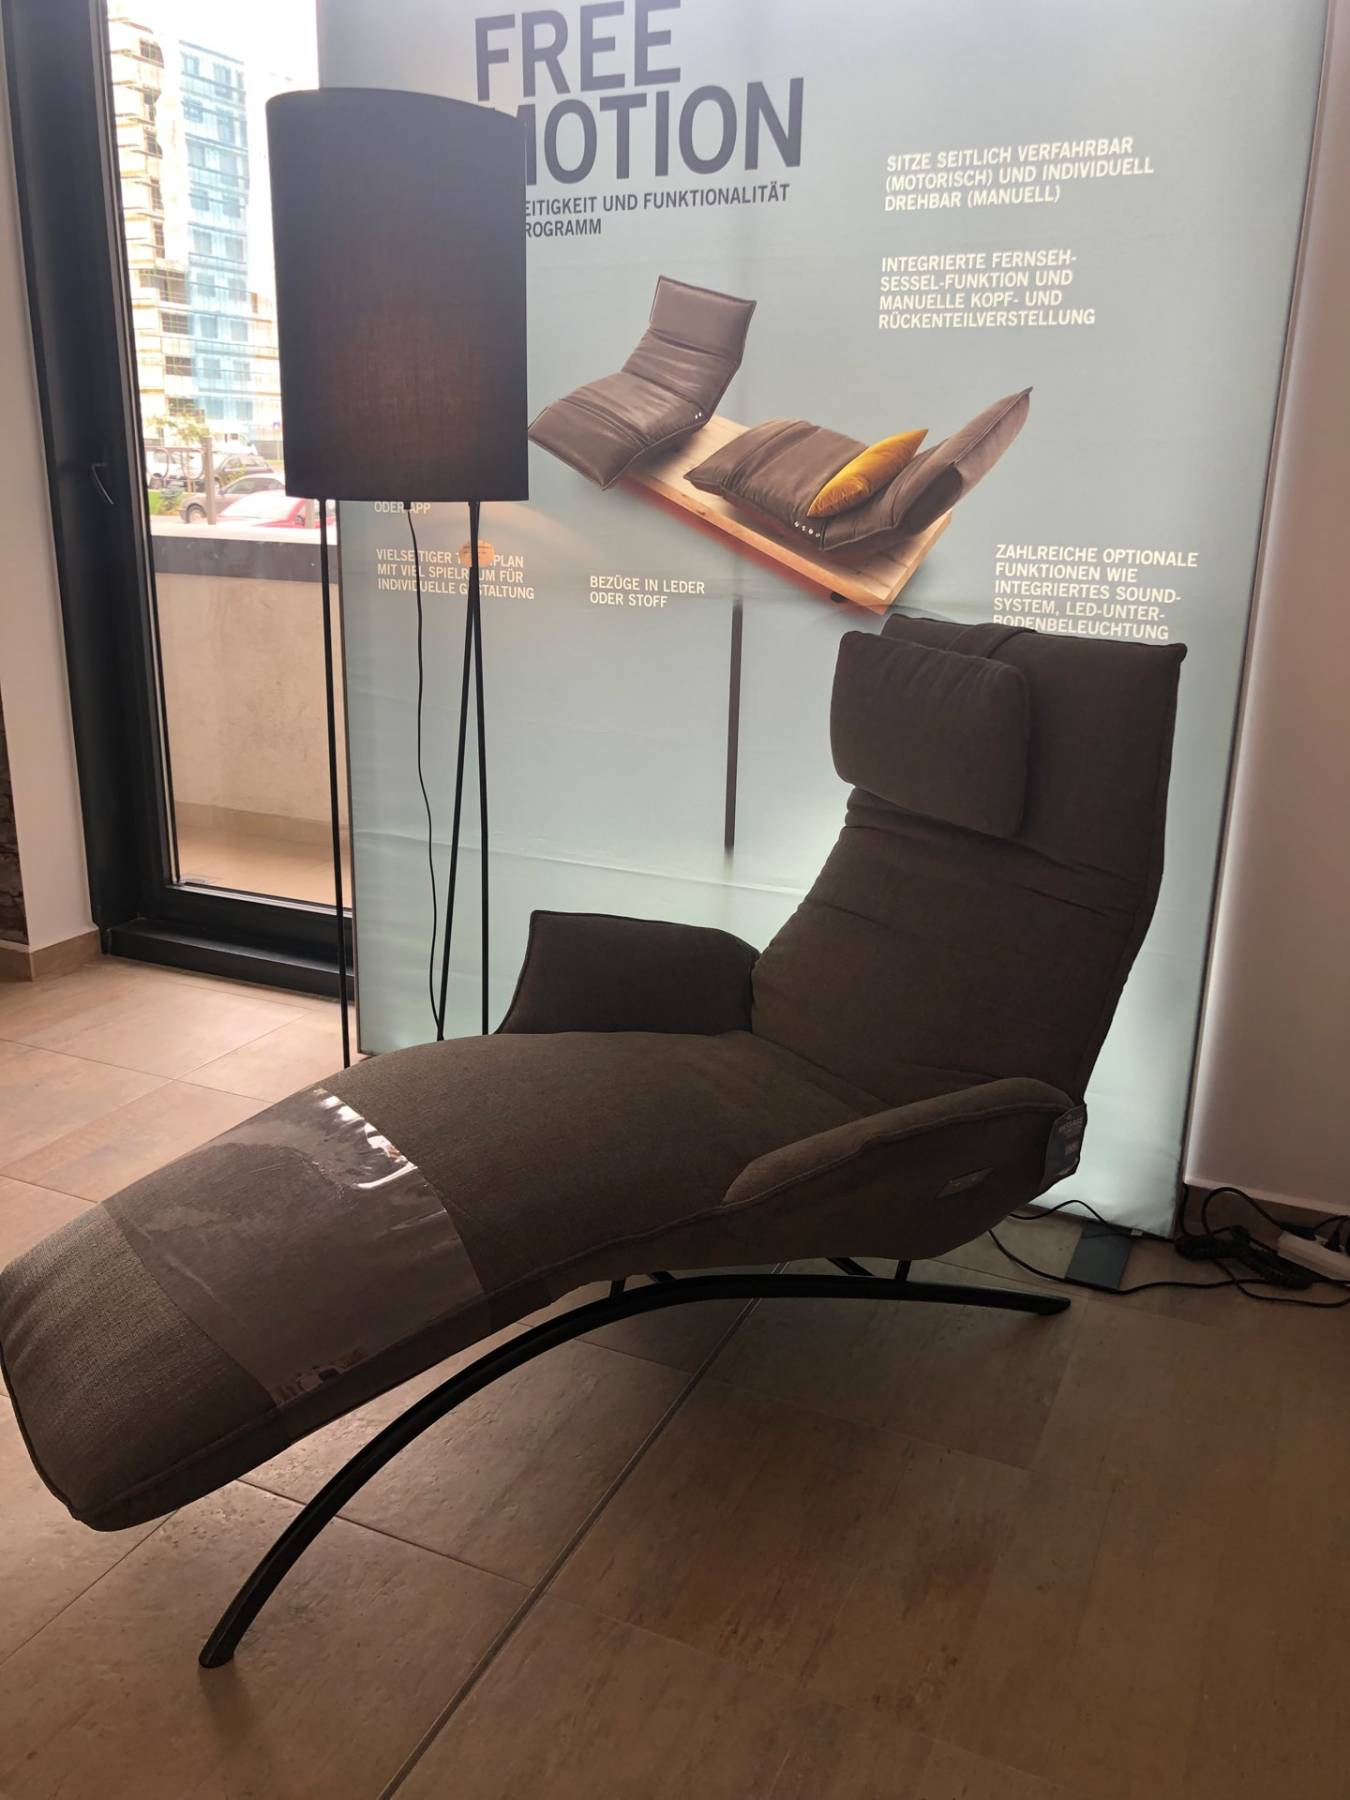 Lichidare - Fotoliu recliner cu masaj Koinor Joleen, gri închis